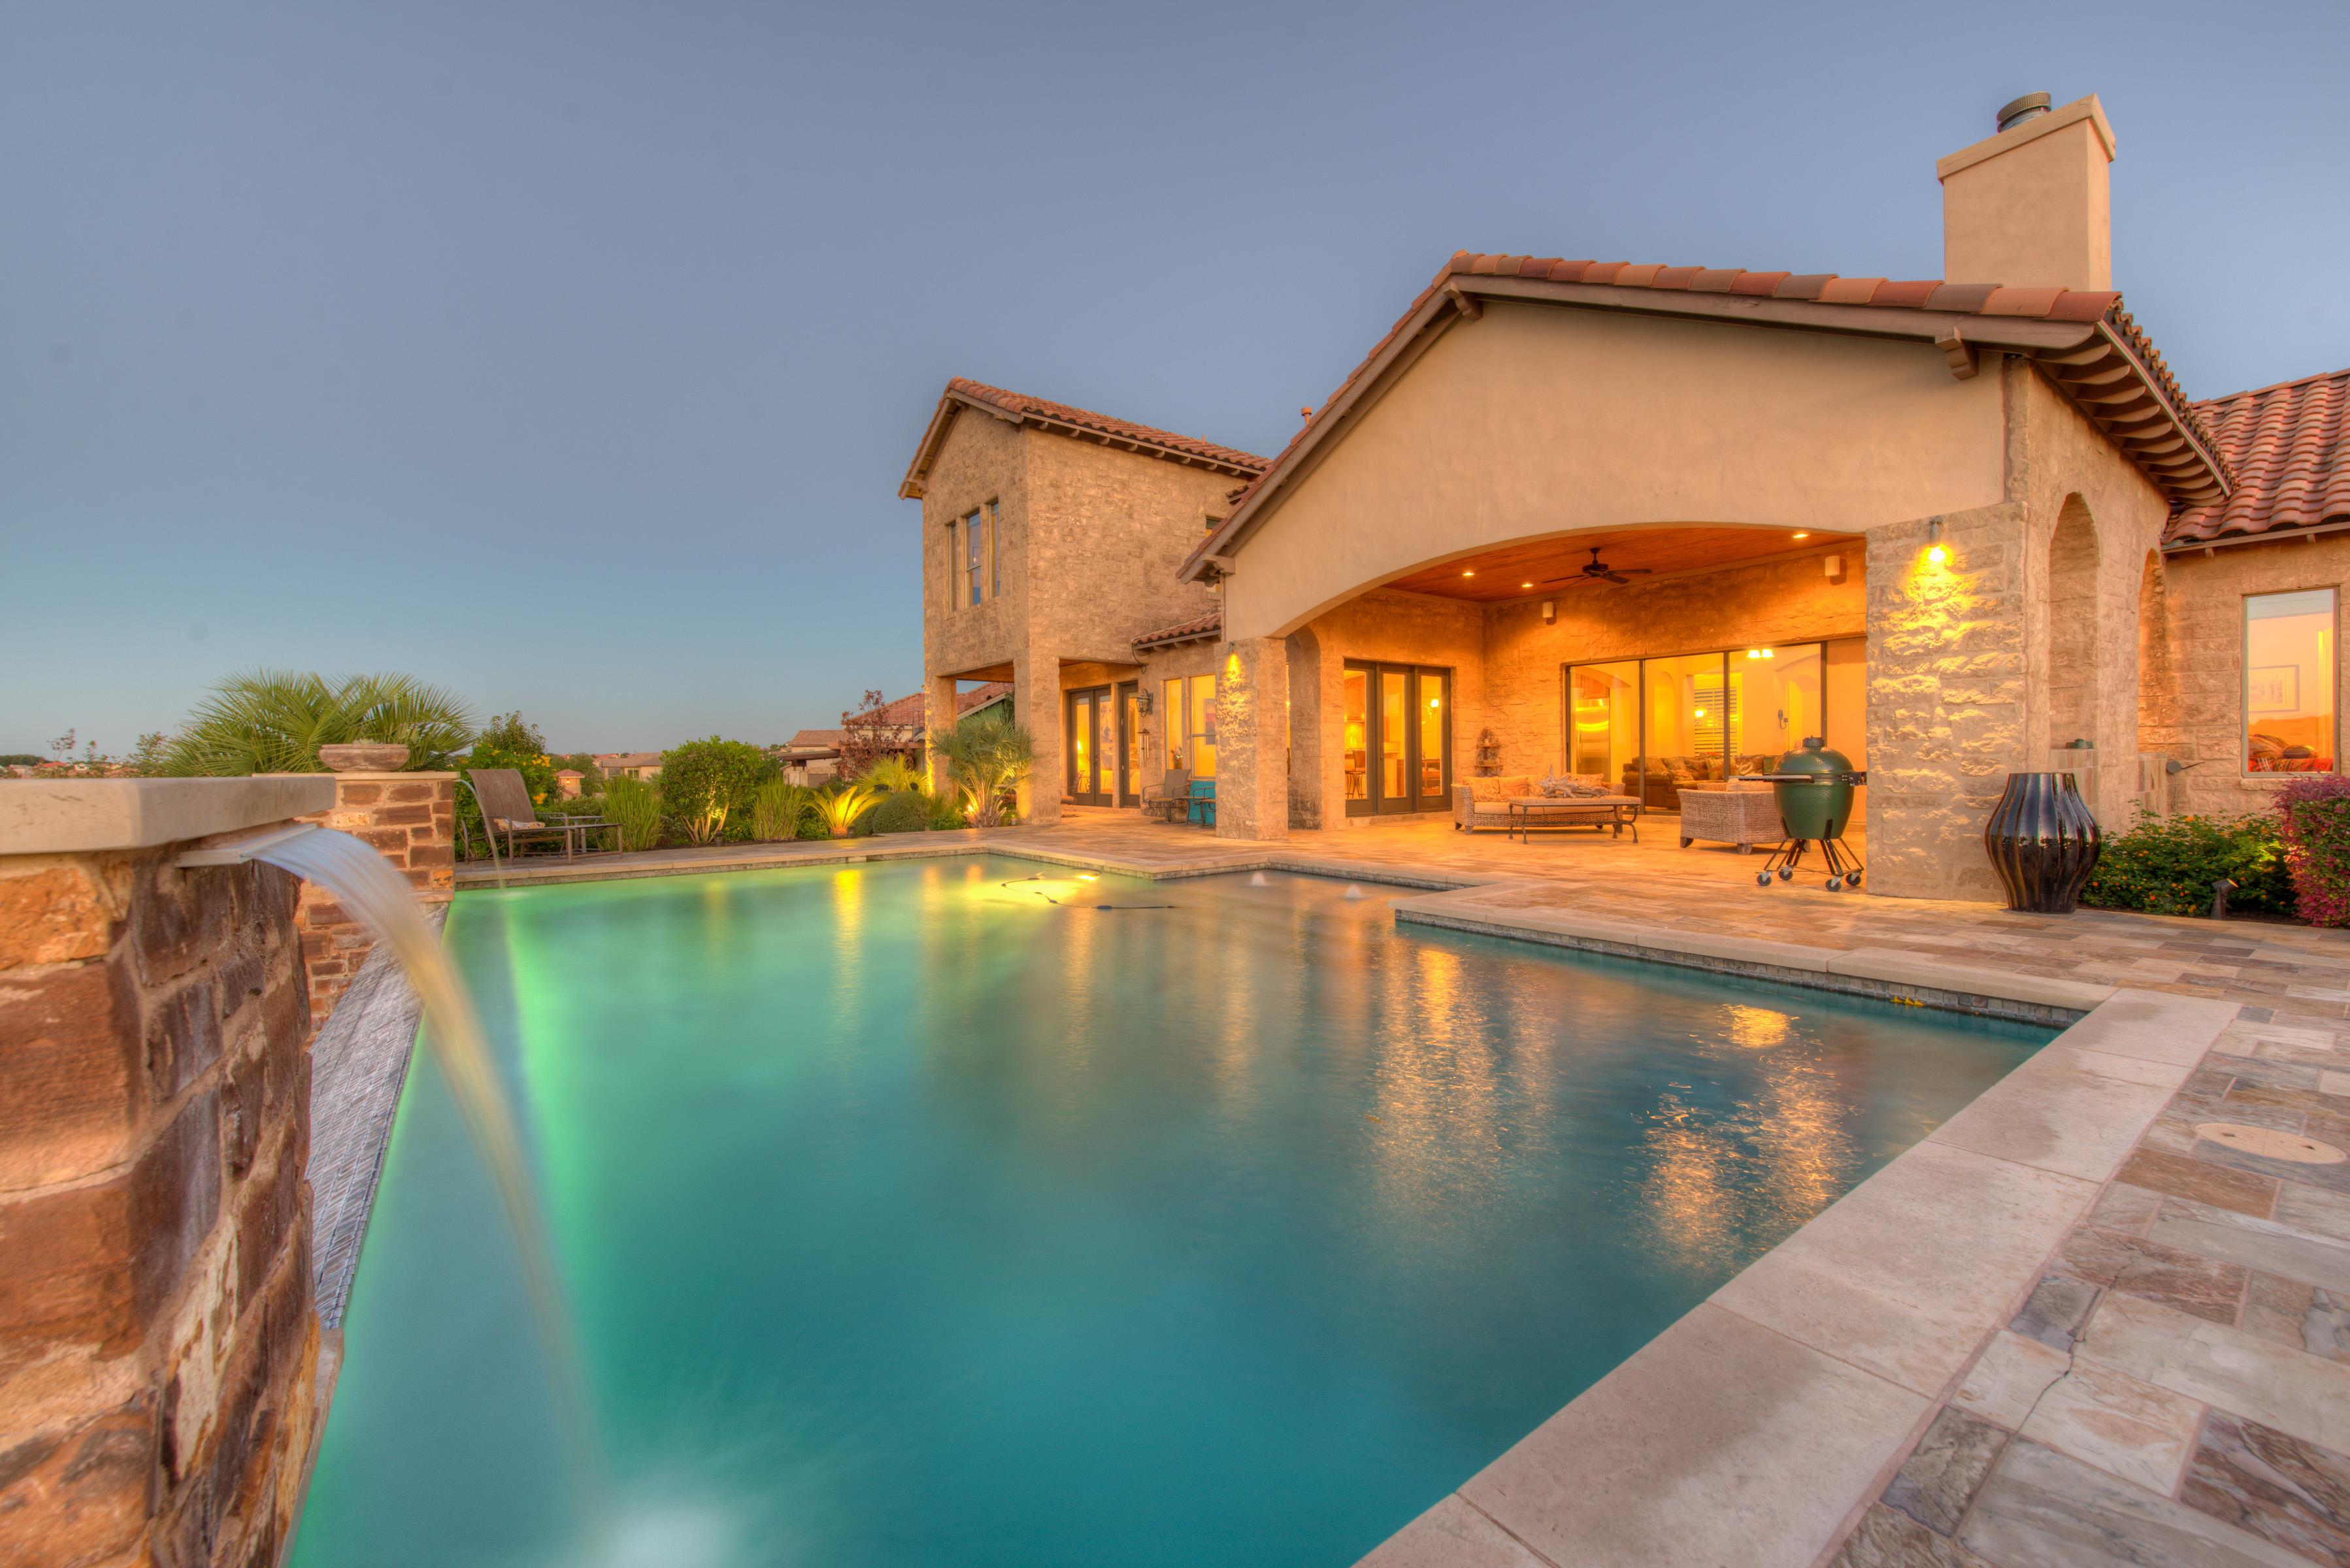 Single Family Home for Sale at Custom Mediterranean Estate 3820 Pawnee Pass Austin, Texas 78738 United States